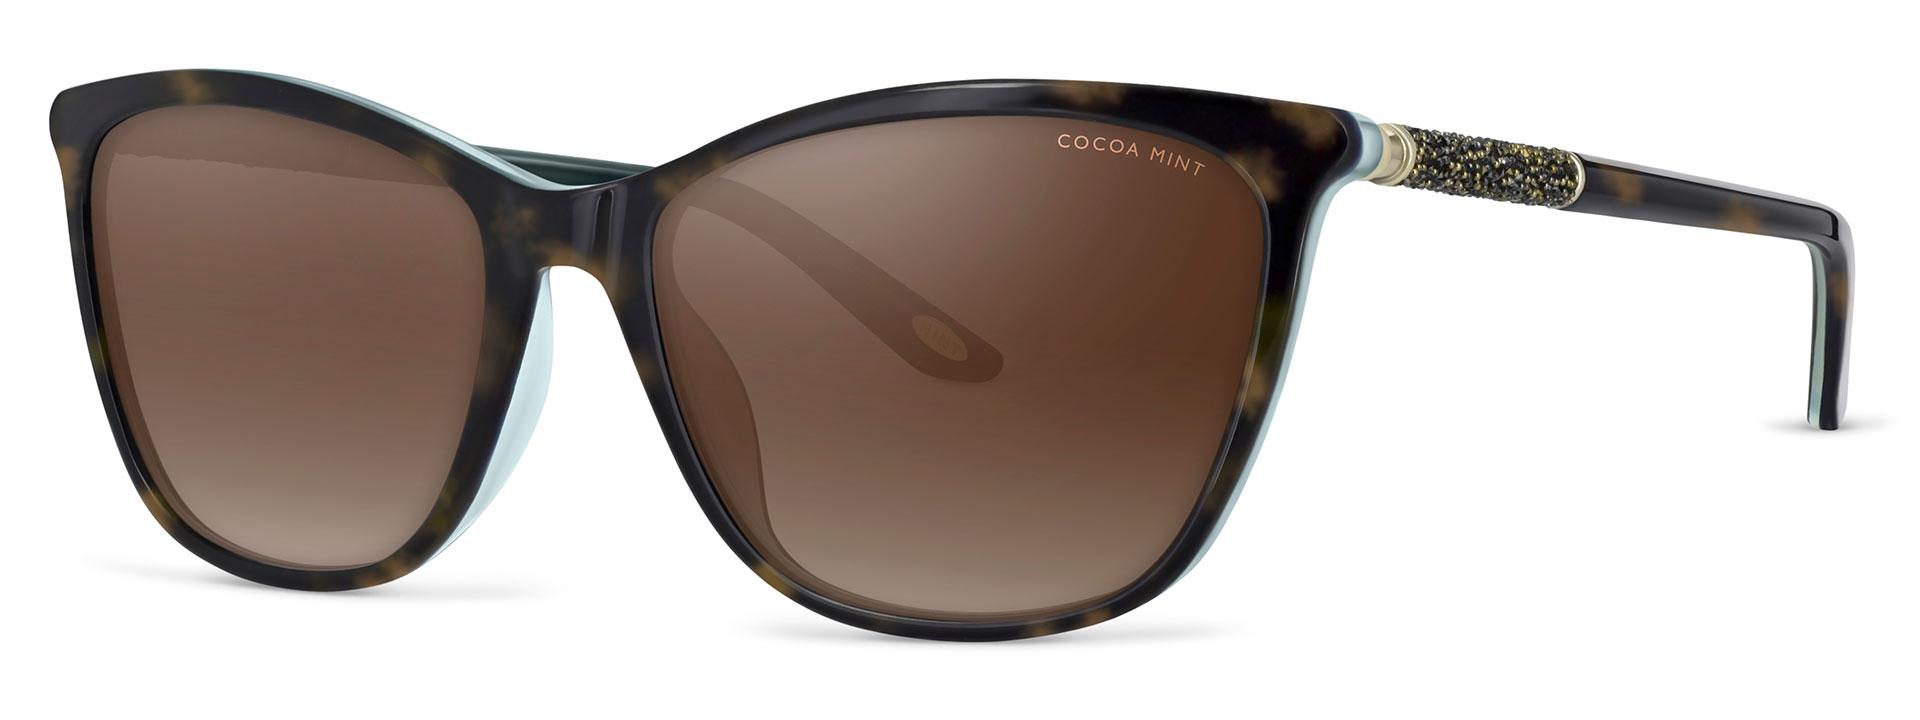 Cocoa Mint Sun Glasses - Tortoiseshell - CMS2066-C2